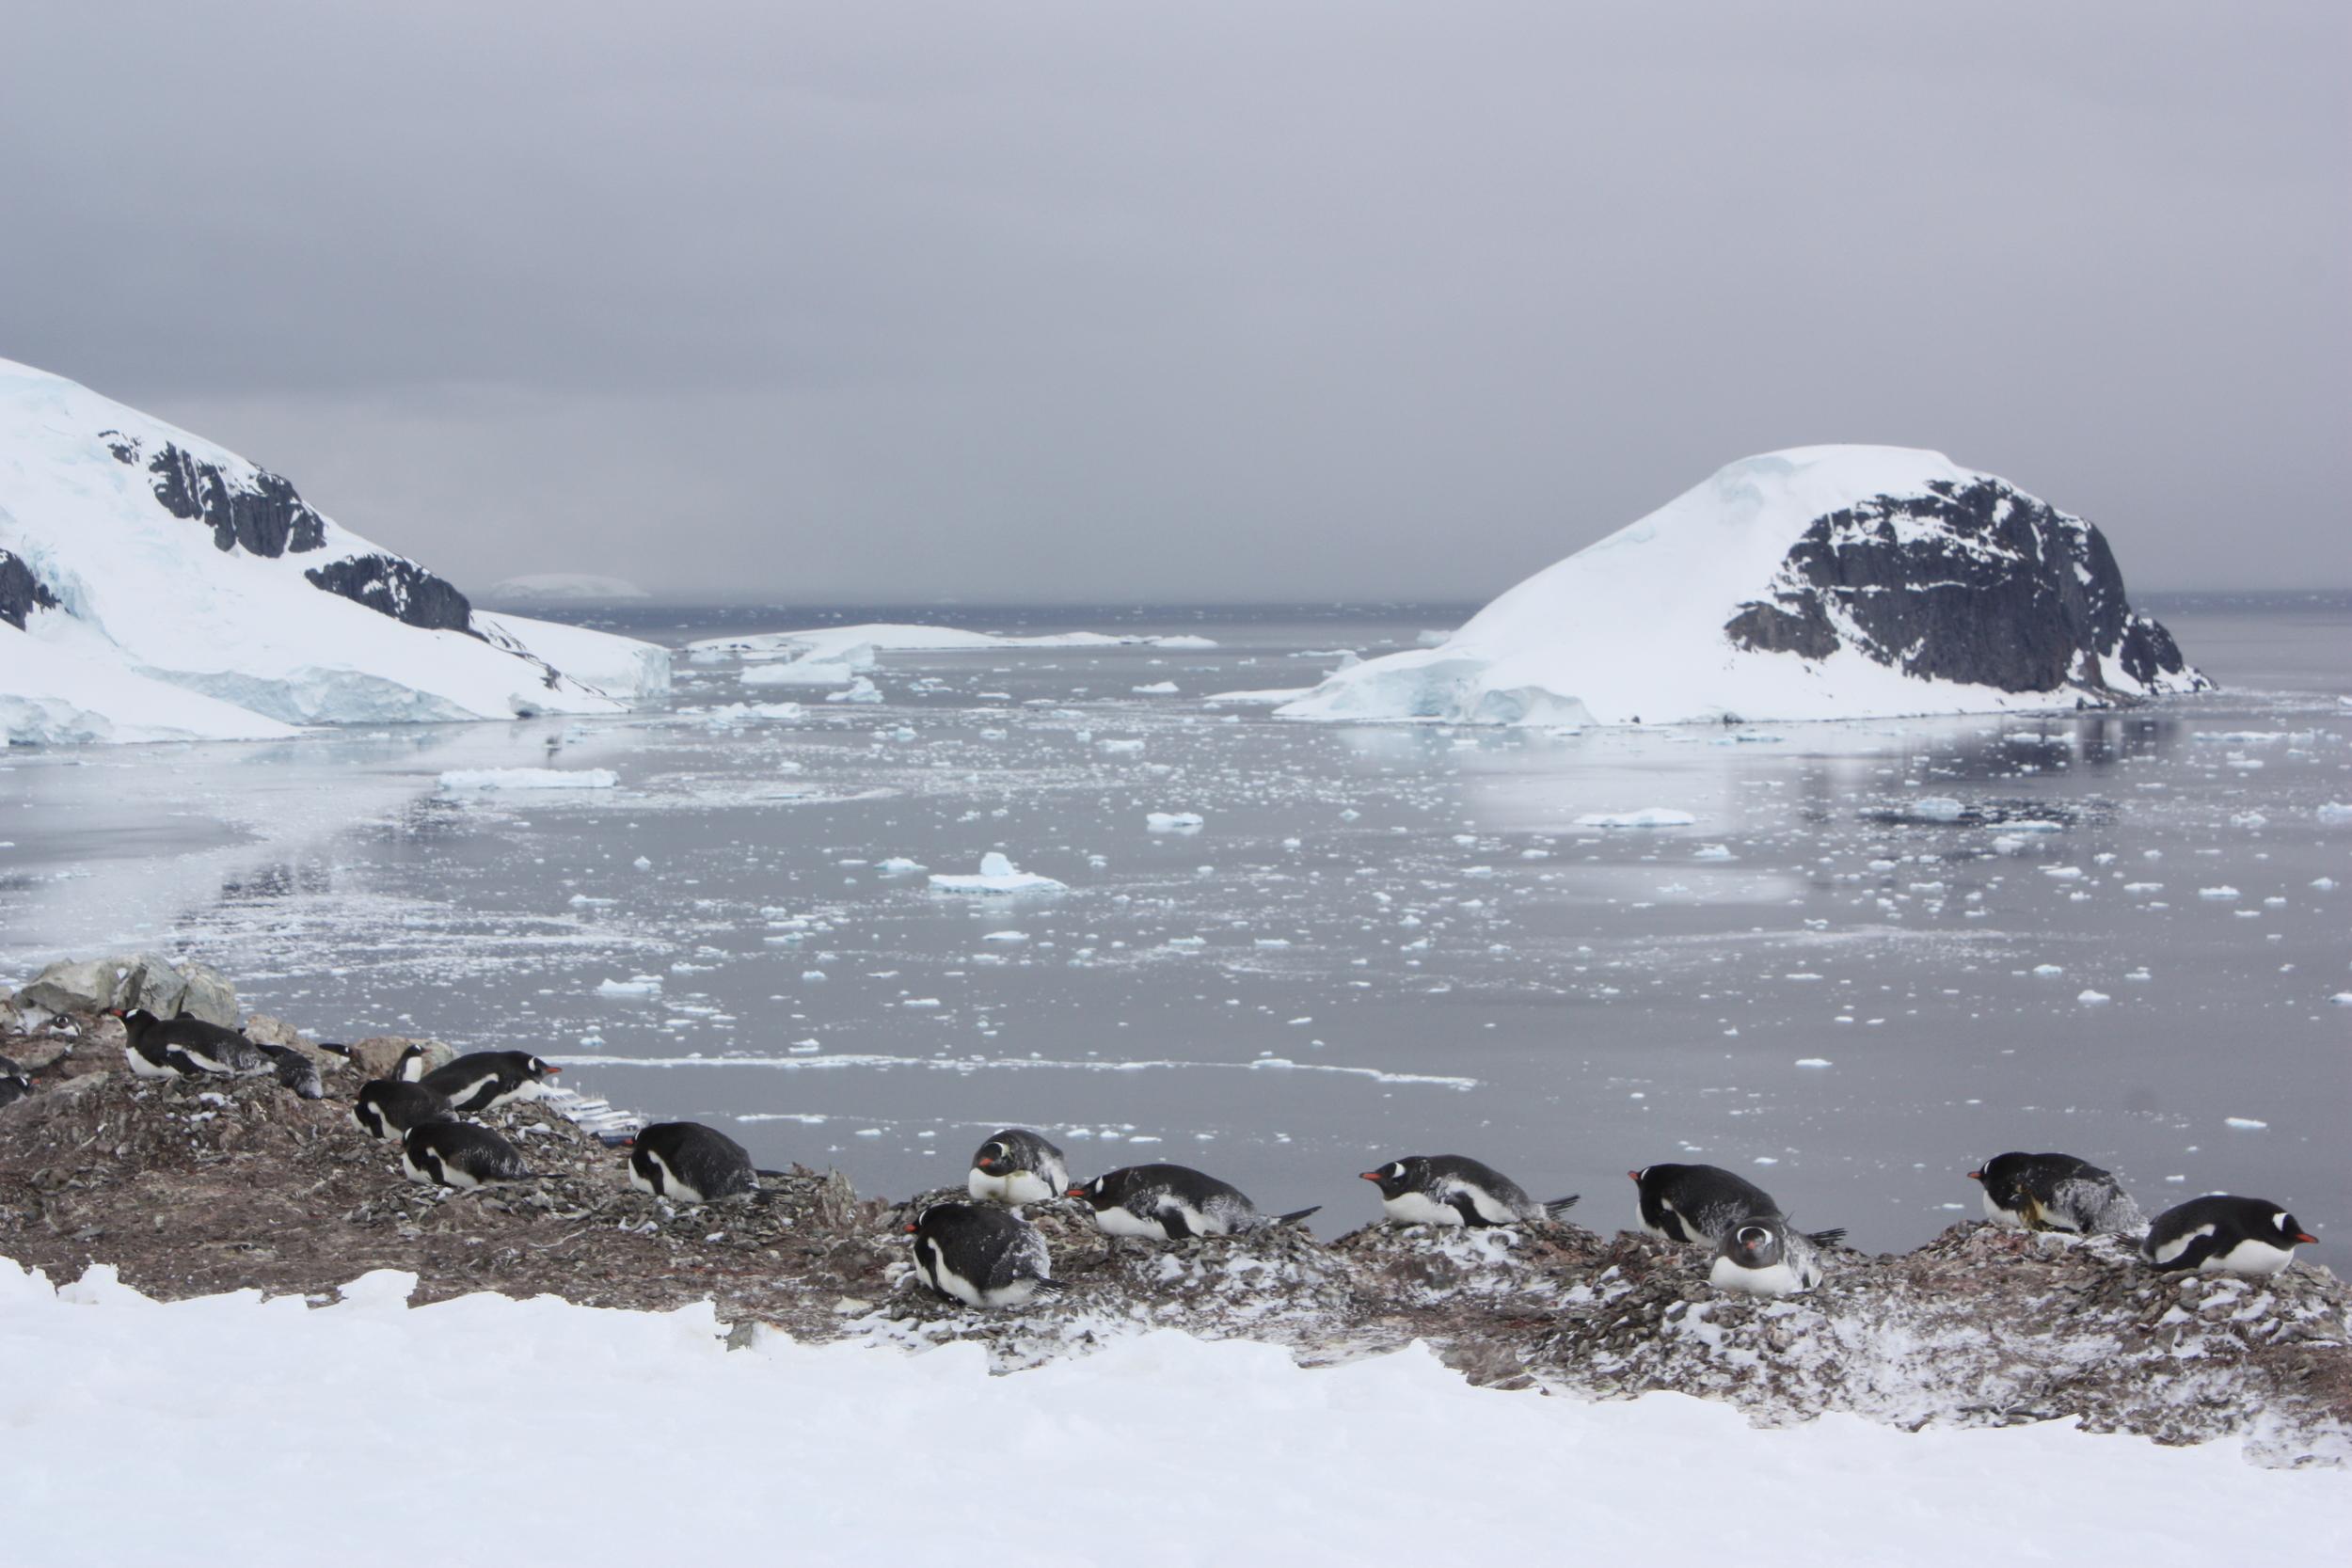 Penguin Colony, Danco Island, Antarctica